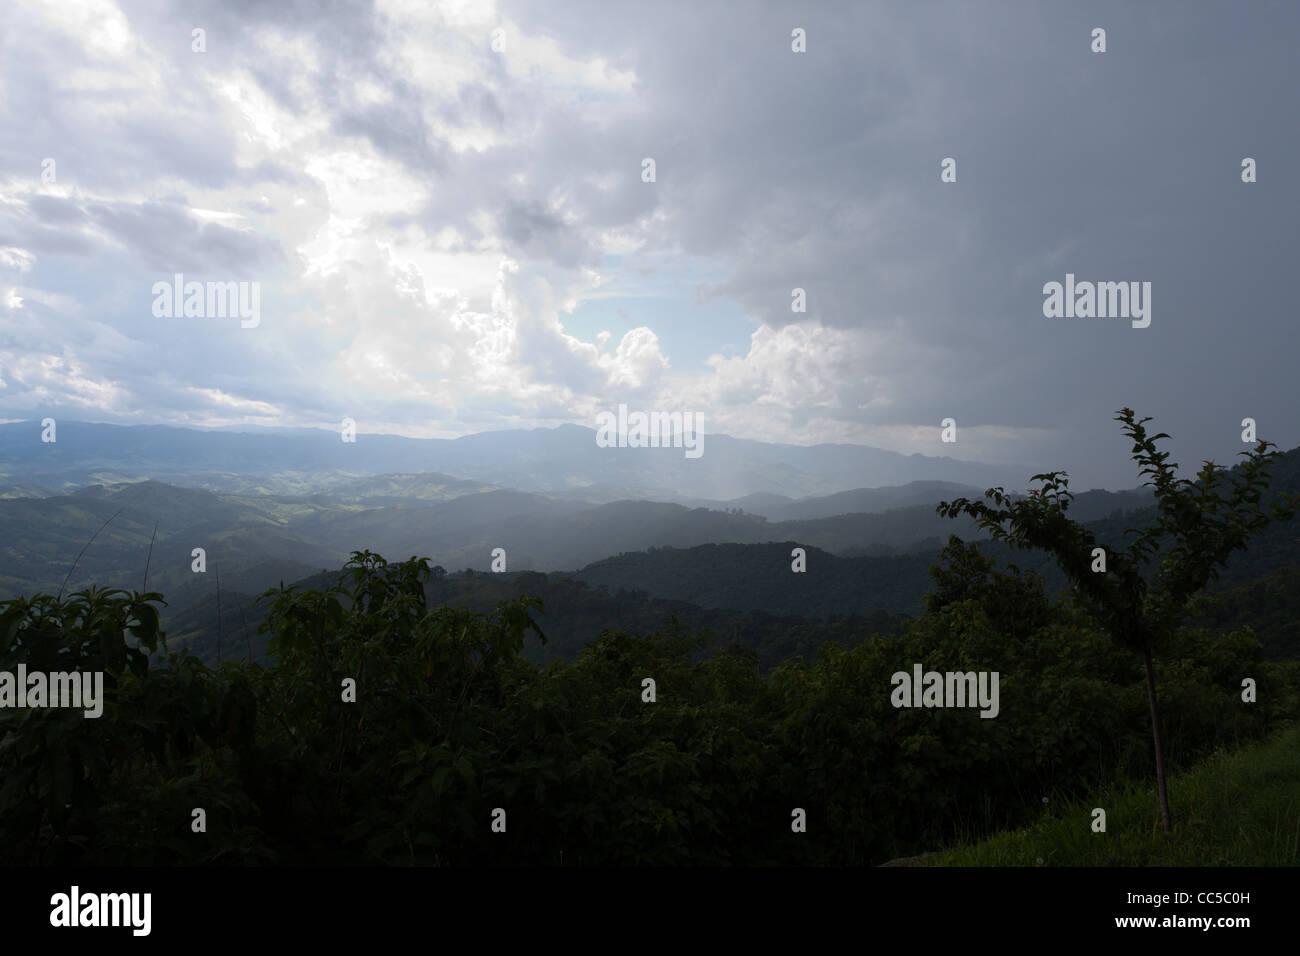 Serra da Mantiqueira (Mantiqueira Mountains), cloudy afternoon, viewed from Vista Chinesa, Campos do Jordao, State Stock Photo